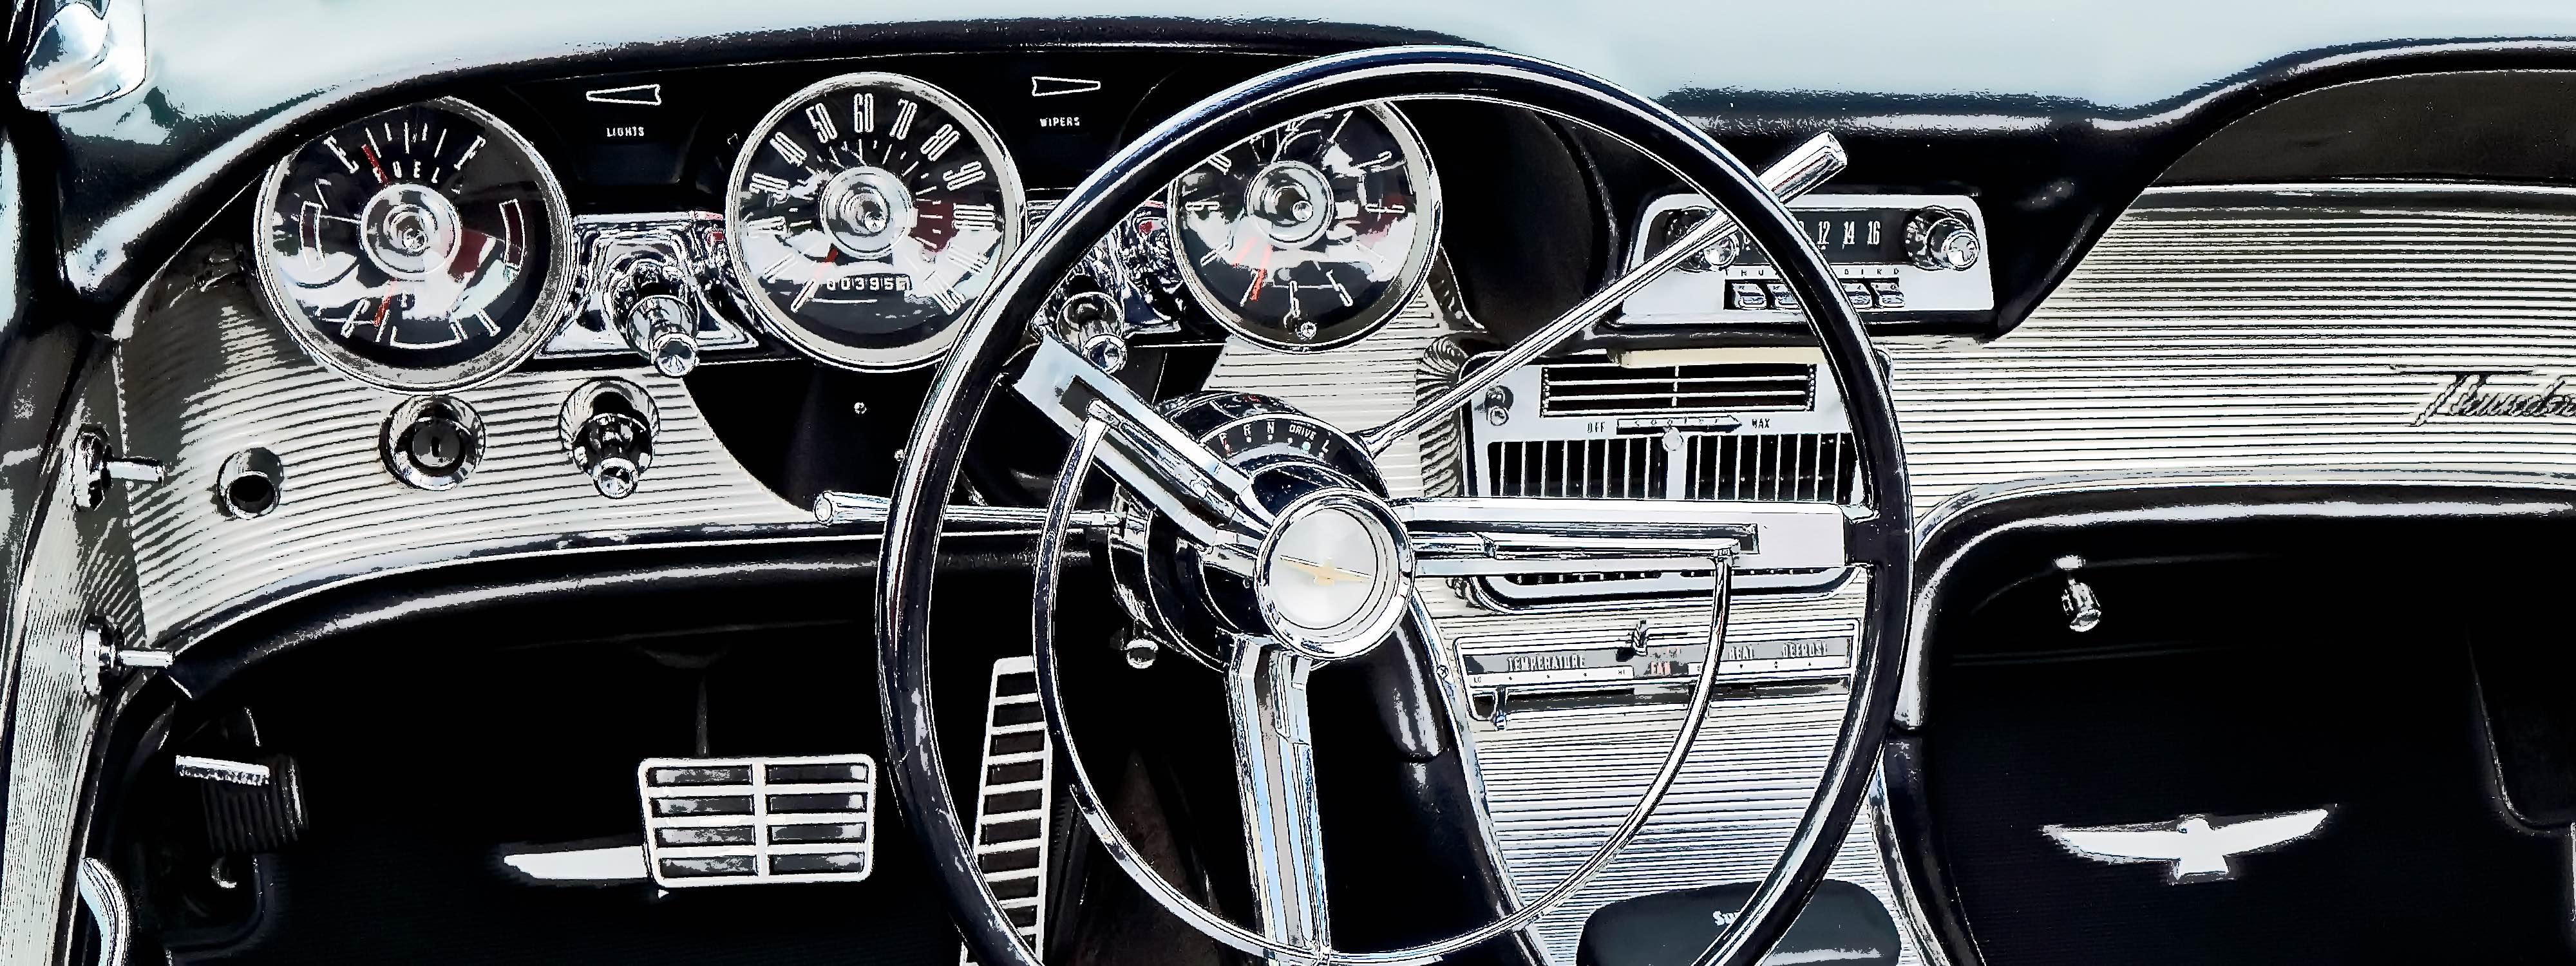 2015-10-17_1963 Ford Thunderbird Roadster Dash_auto_lenkrad